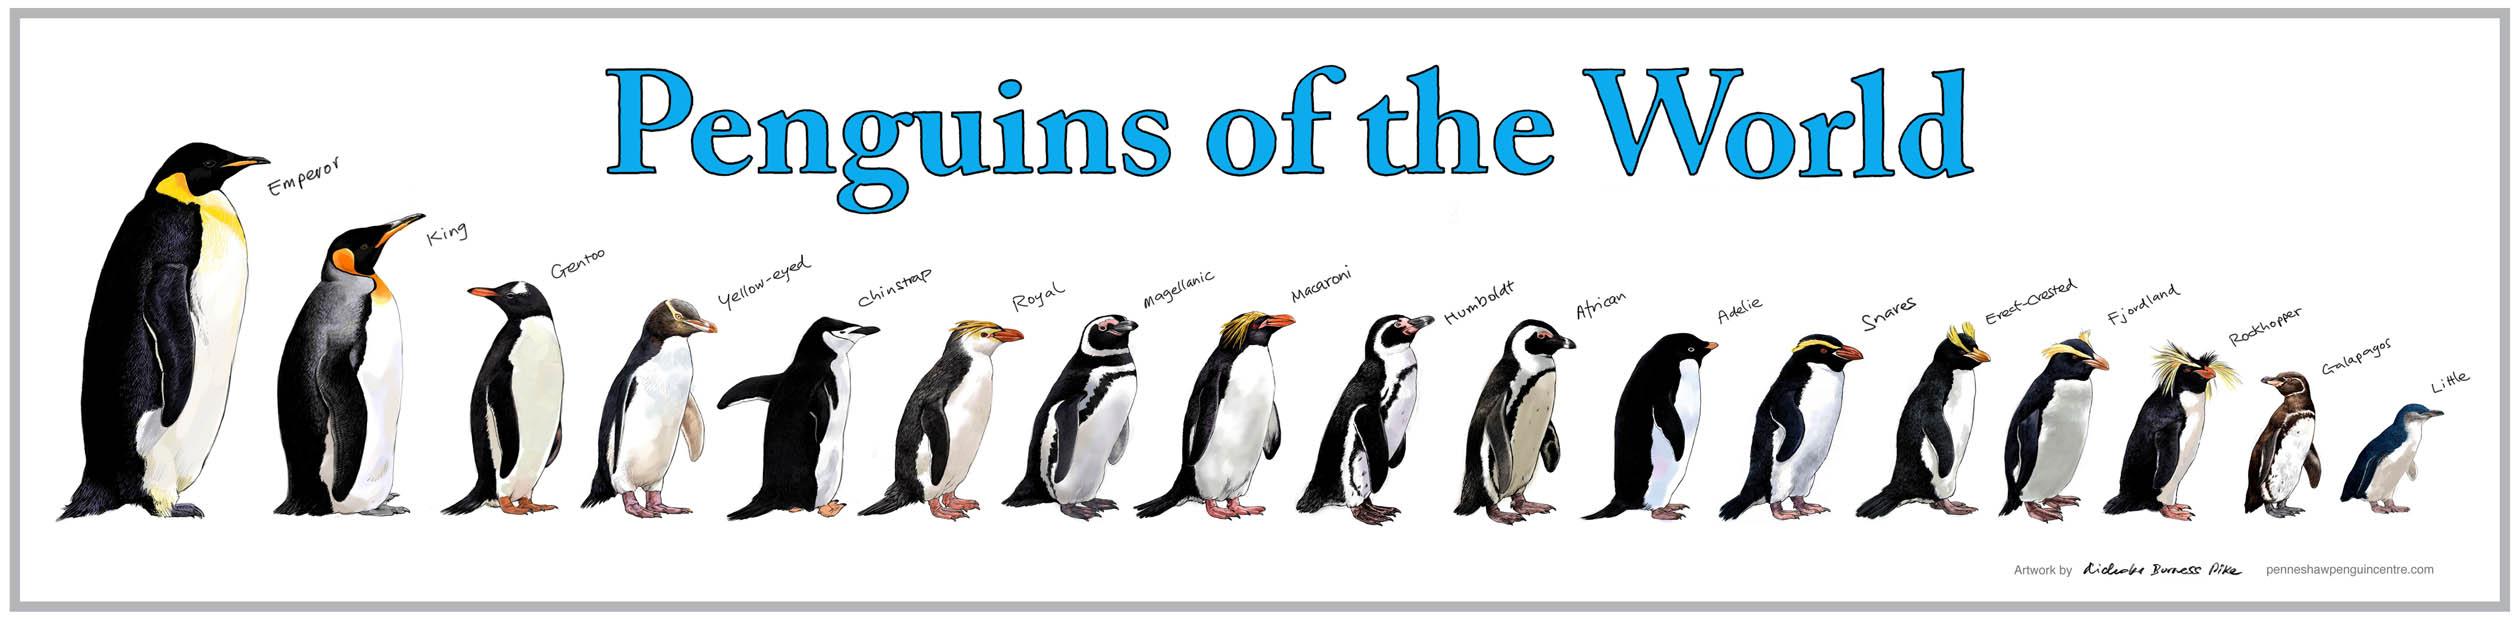 penguinsoftheworldposter30